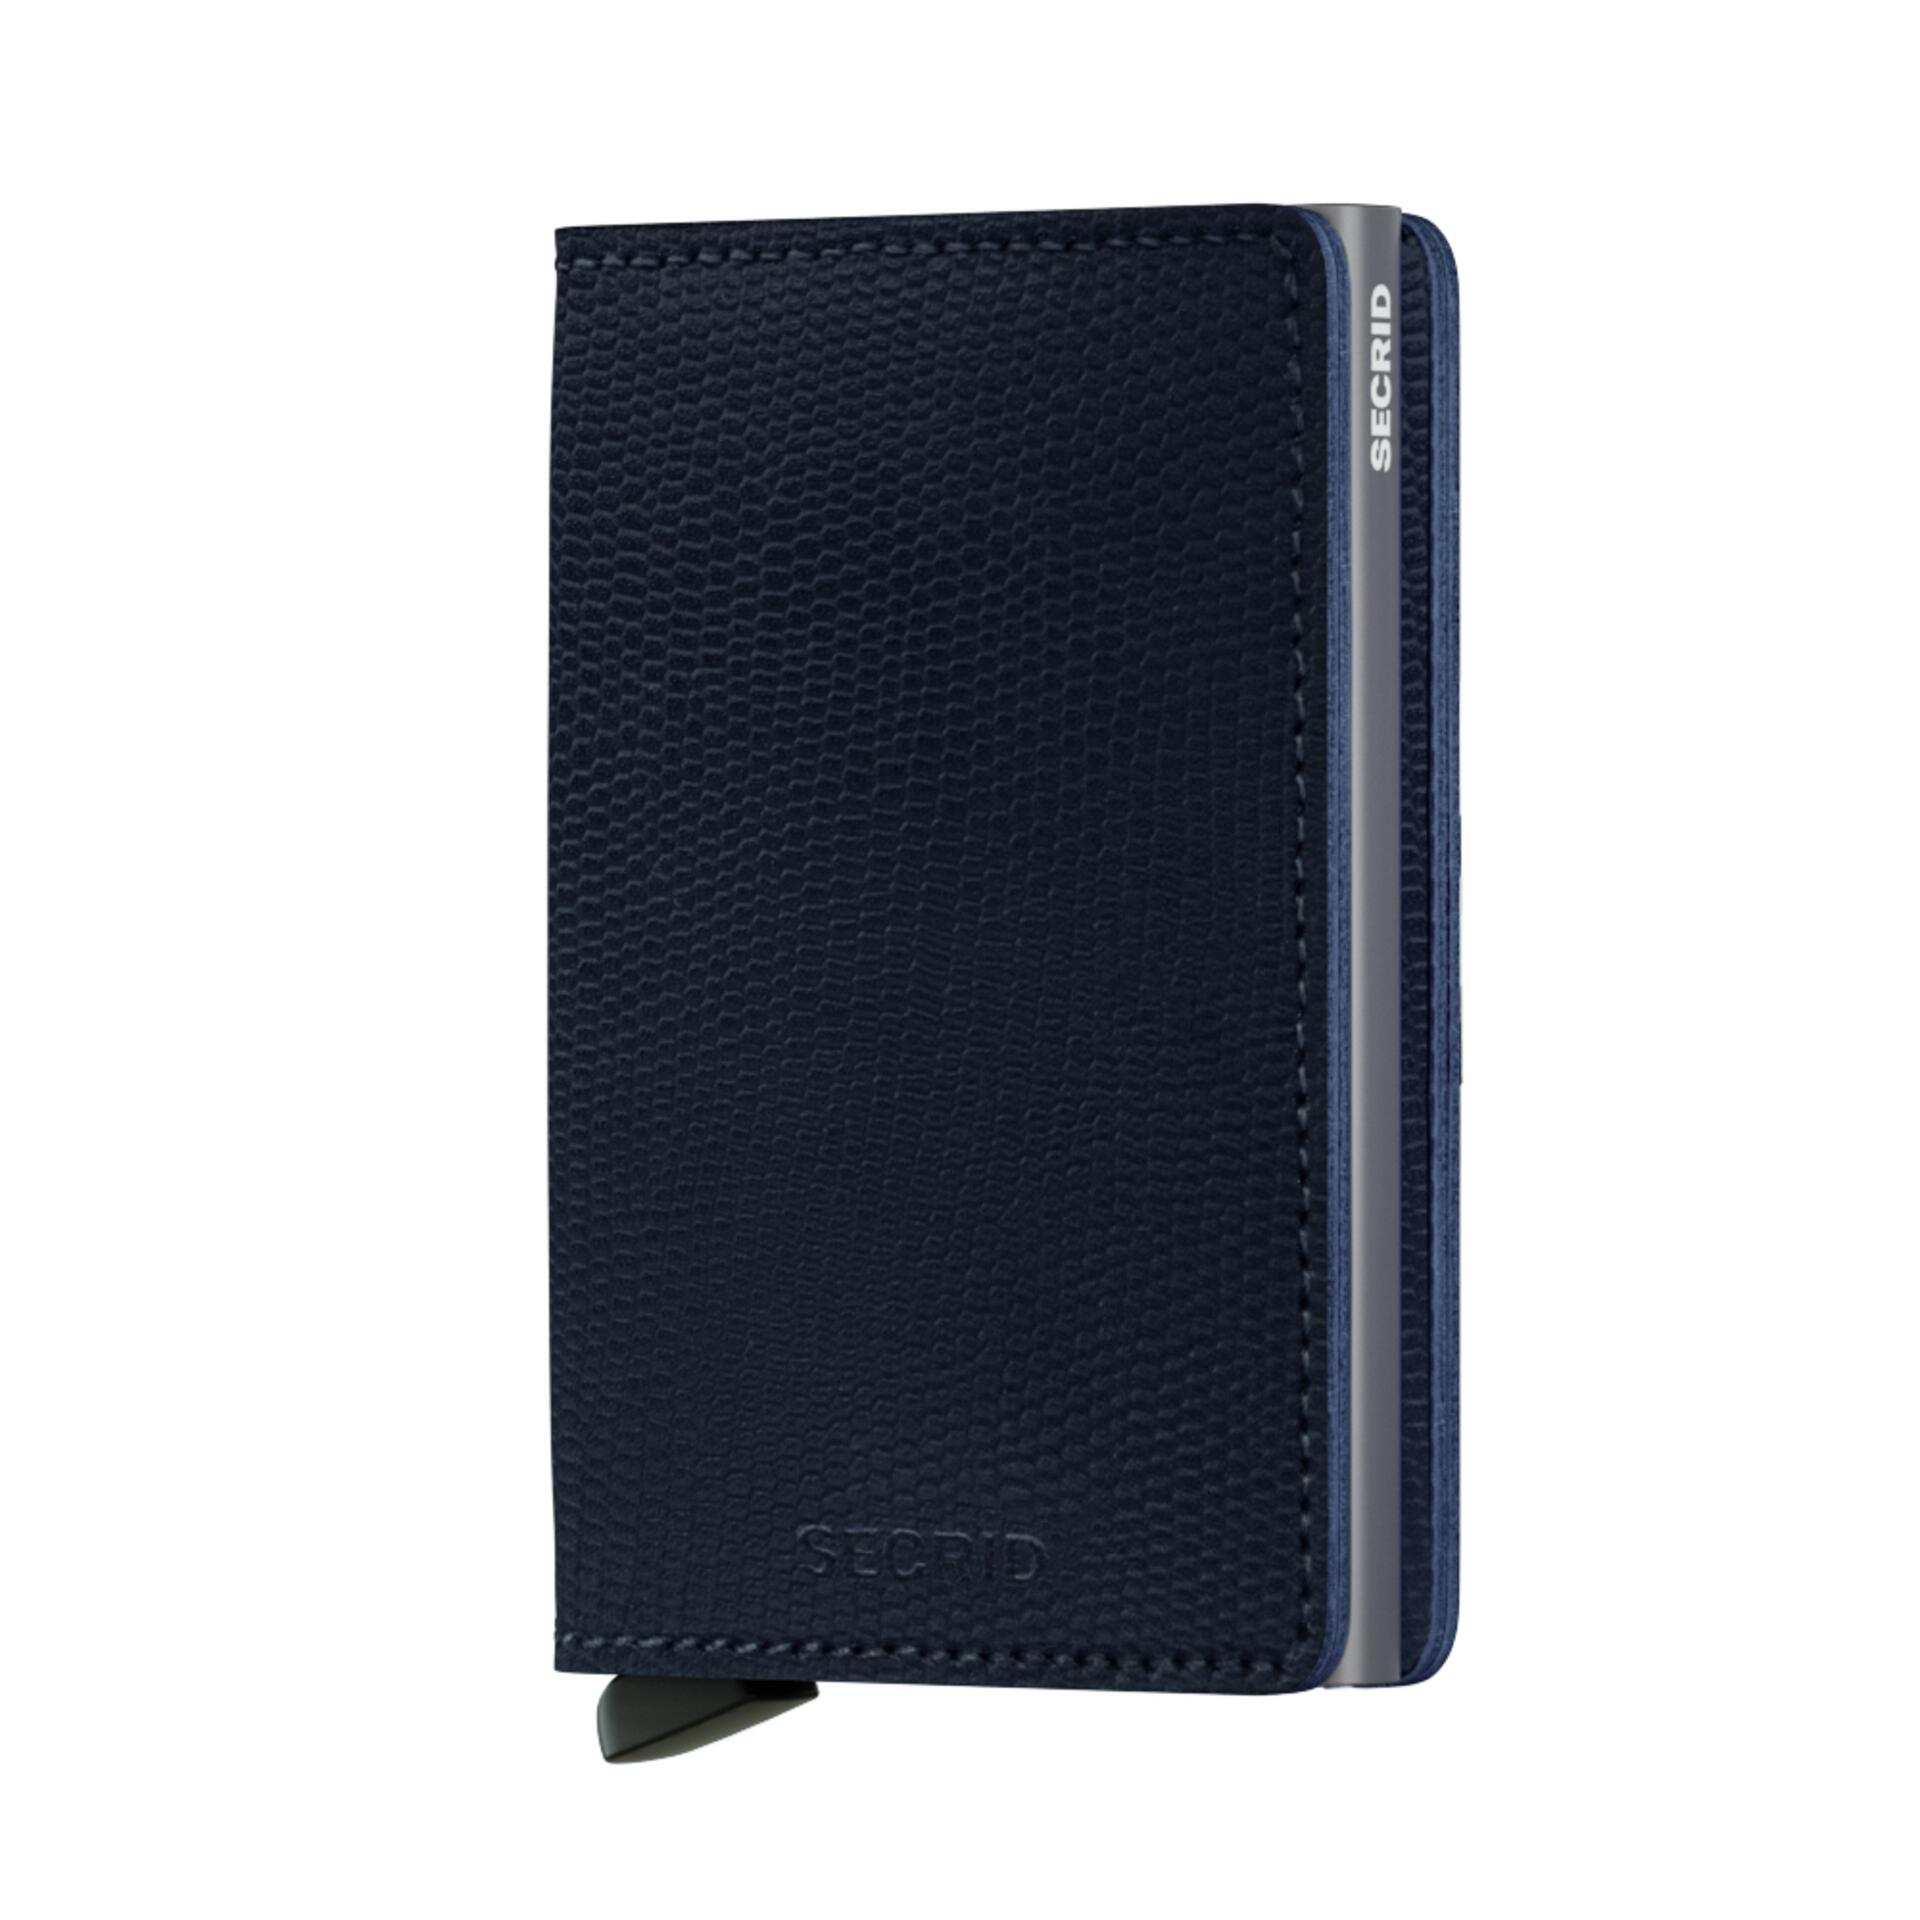 Secrid Slimwallet Rango Blue Titanium Leder